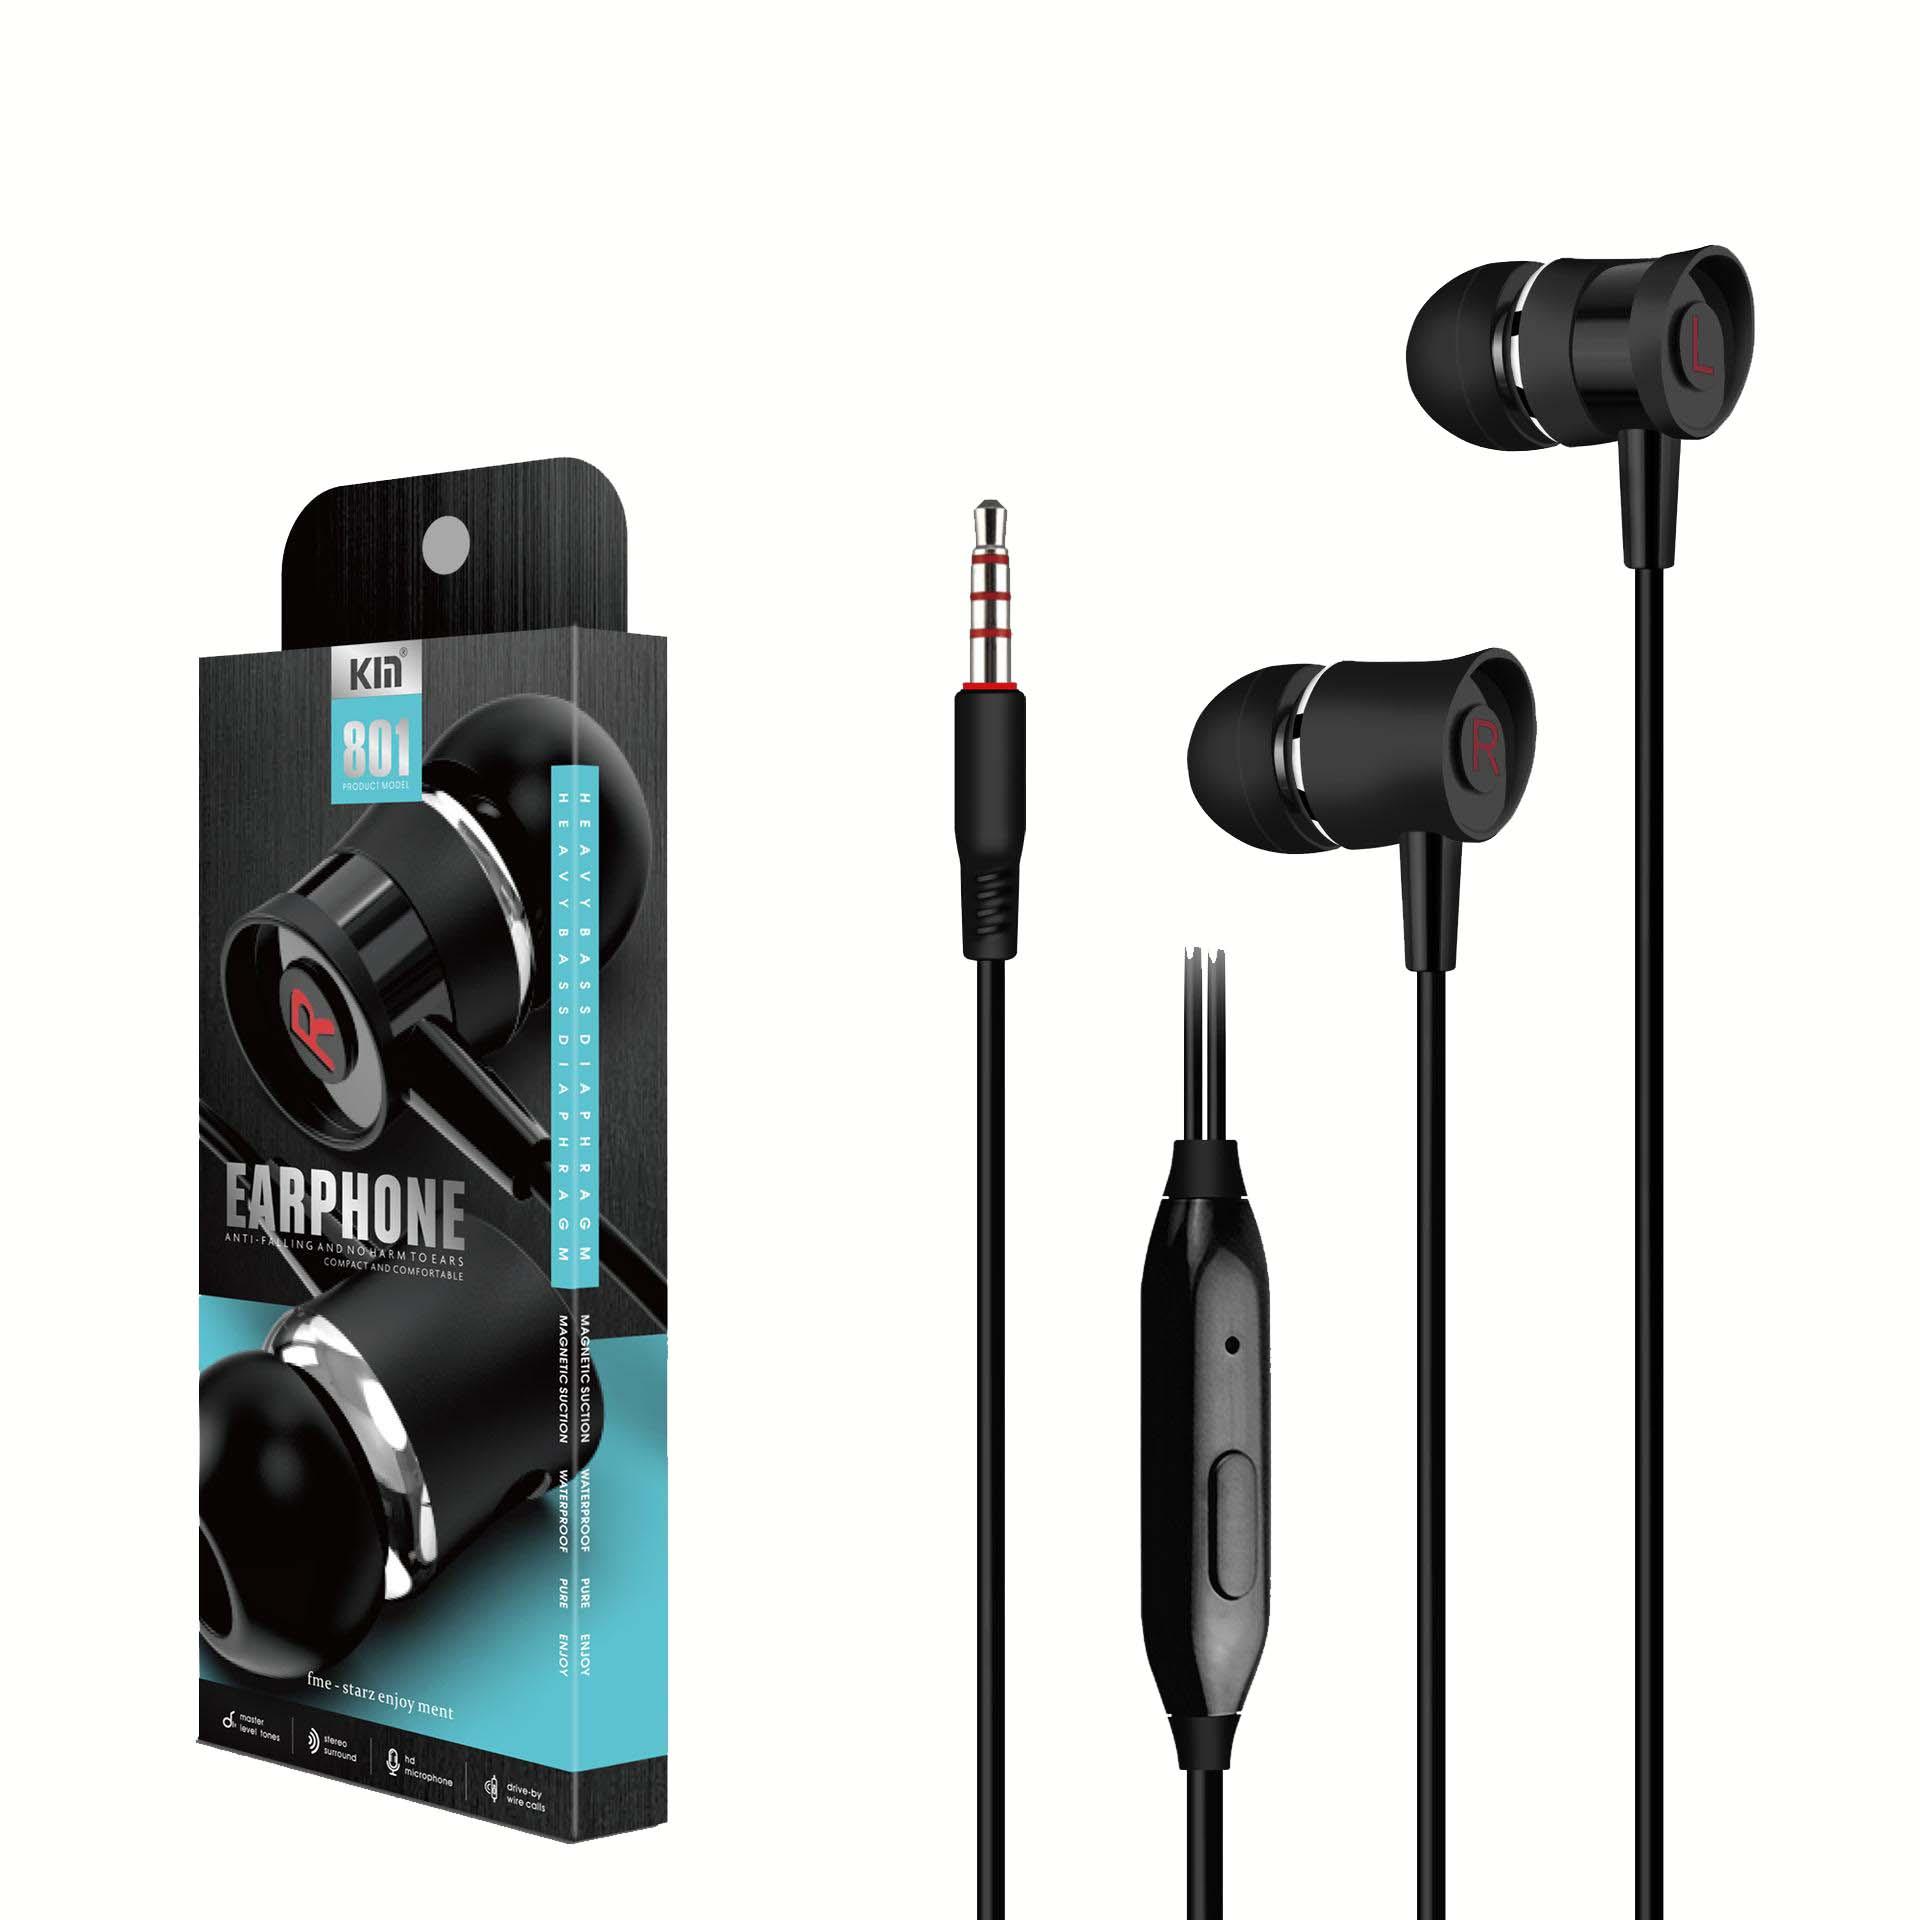 EARPHONE KIN FOR SMARTPHONE OR TAB COLOR 801 ضغط ,Smartphones & Tab Headsets